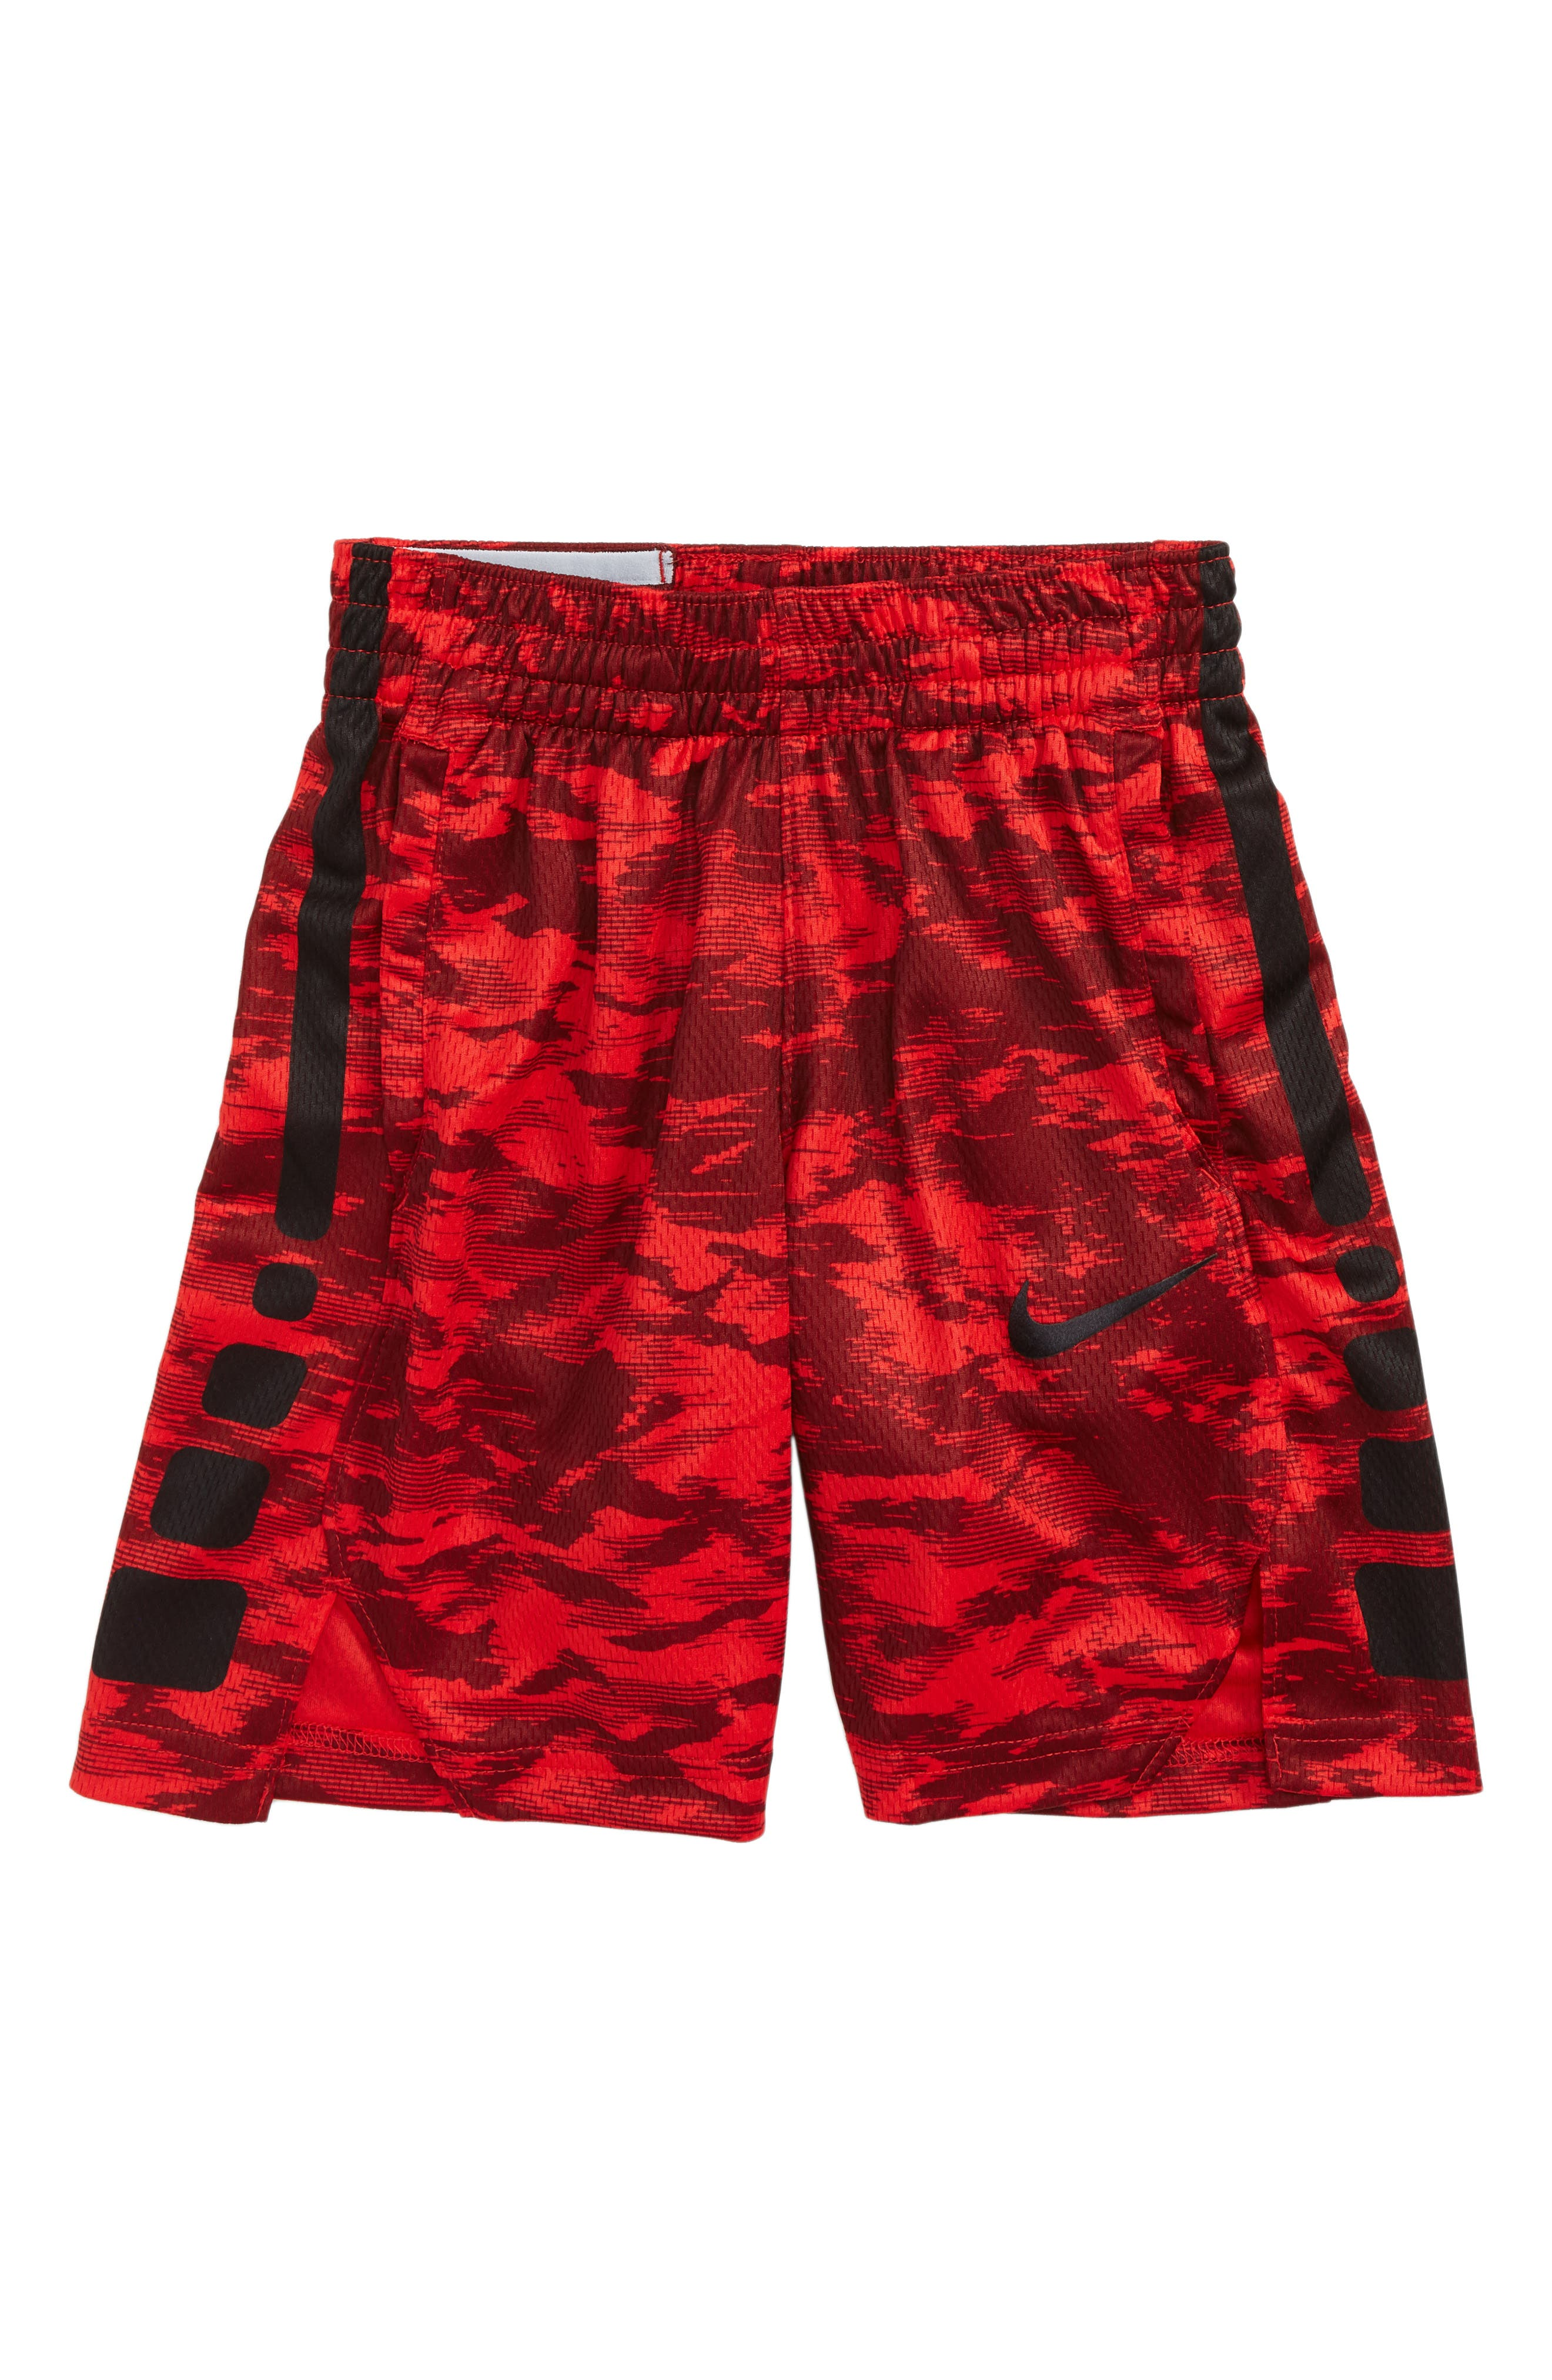 Dry Elite Basketball Shorts,                             Main thumbnail 7, color,